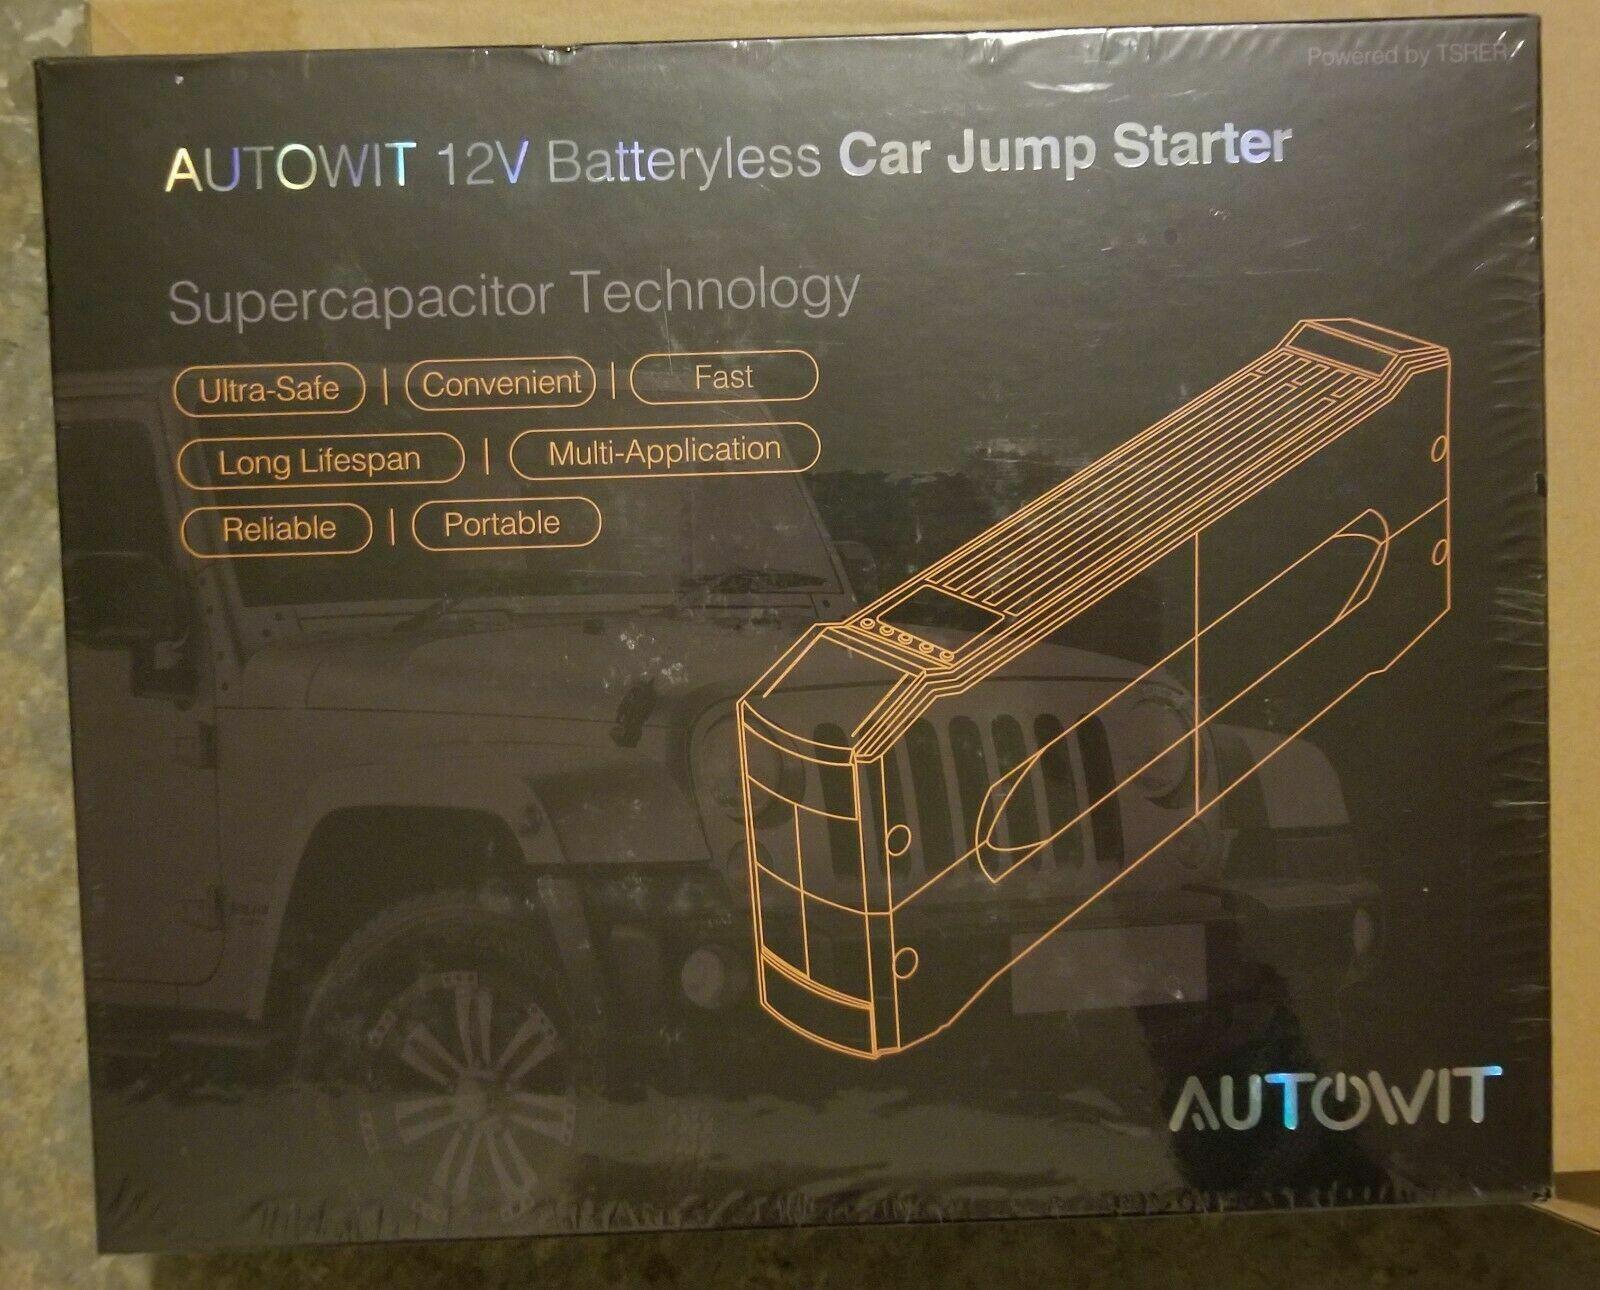 autowit 12V Portable Batteryless Car Jump Starter Supercap B